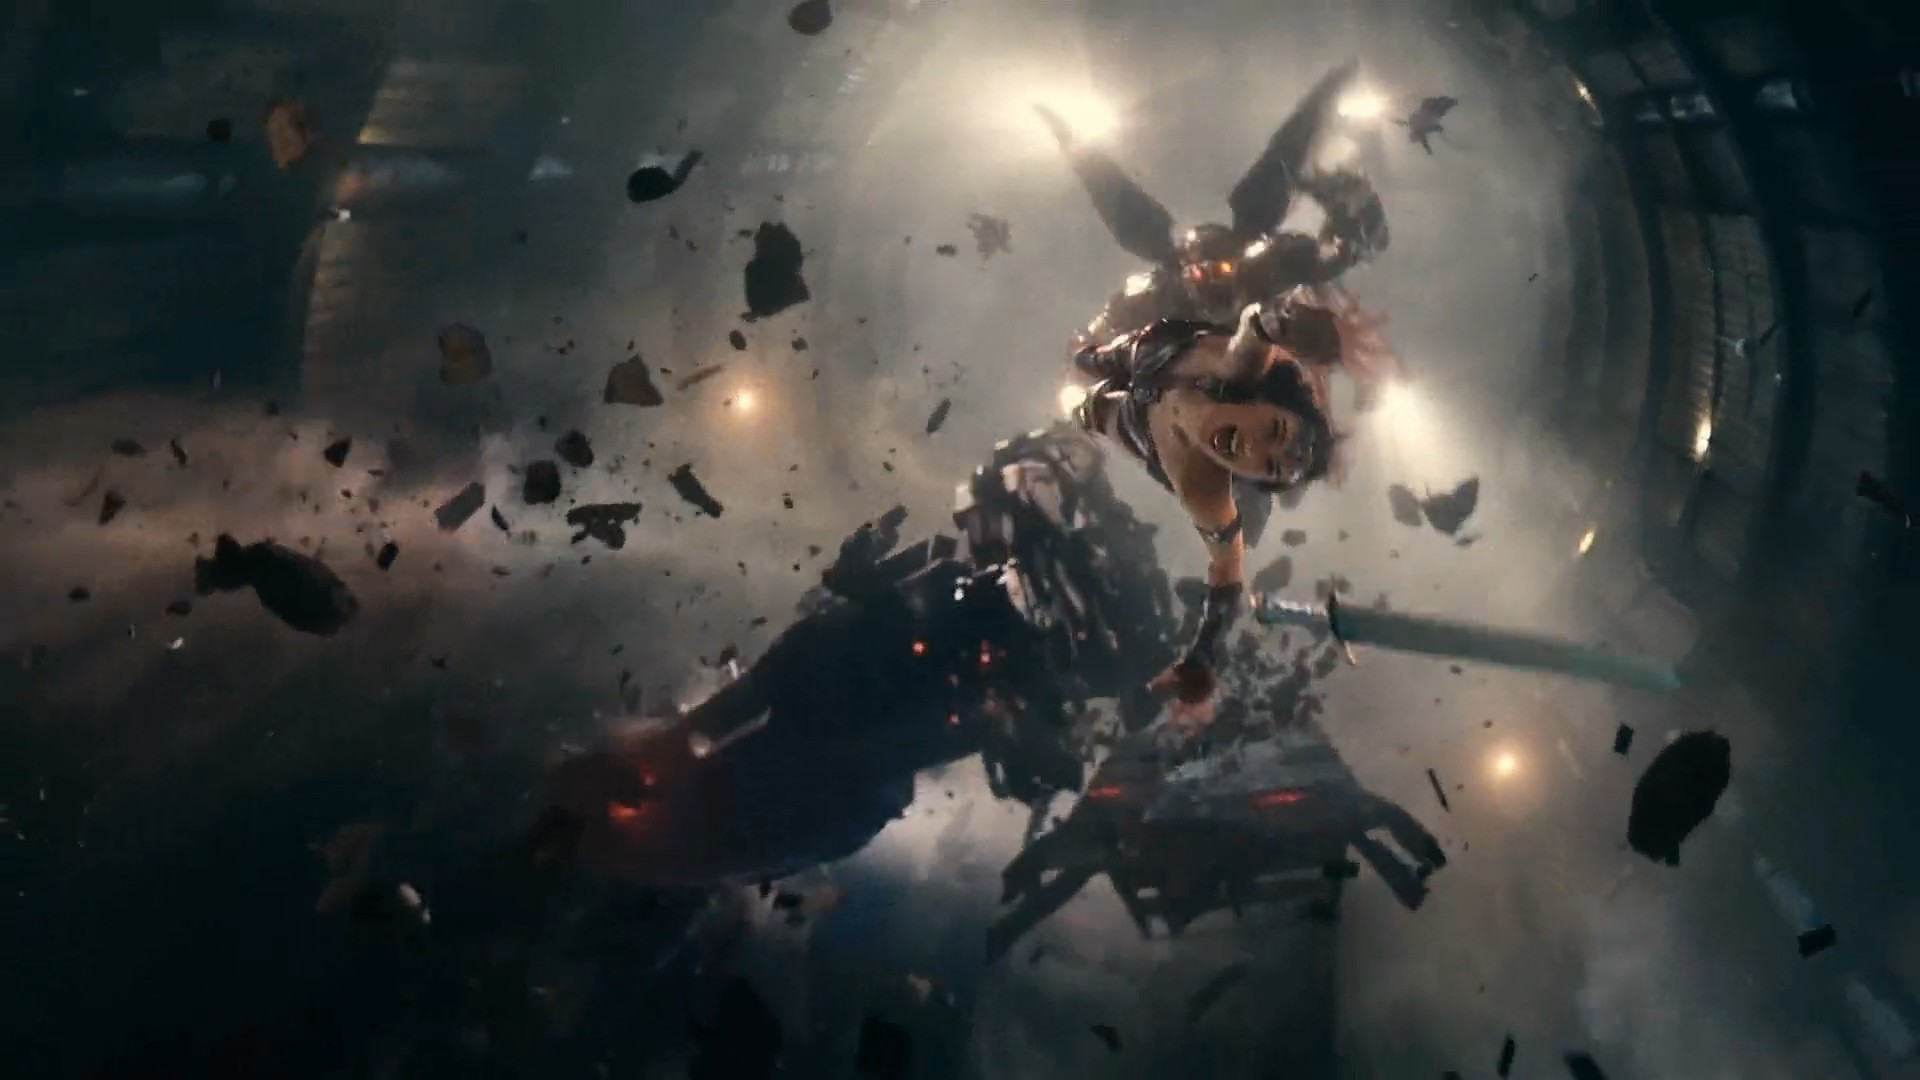 ArtStation - Justice League VFX - The Parademons (2017